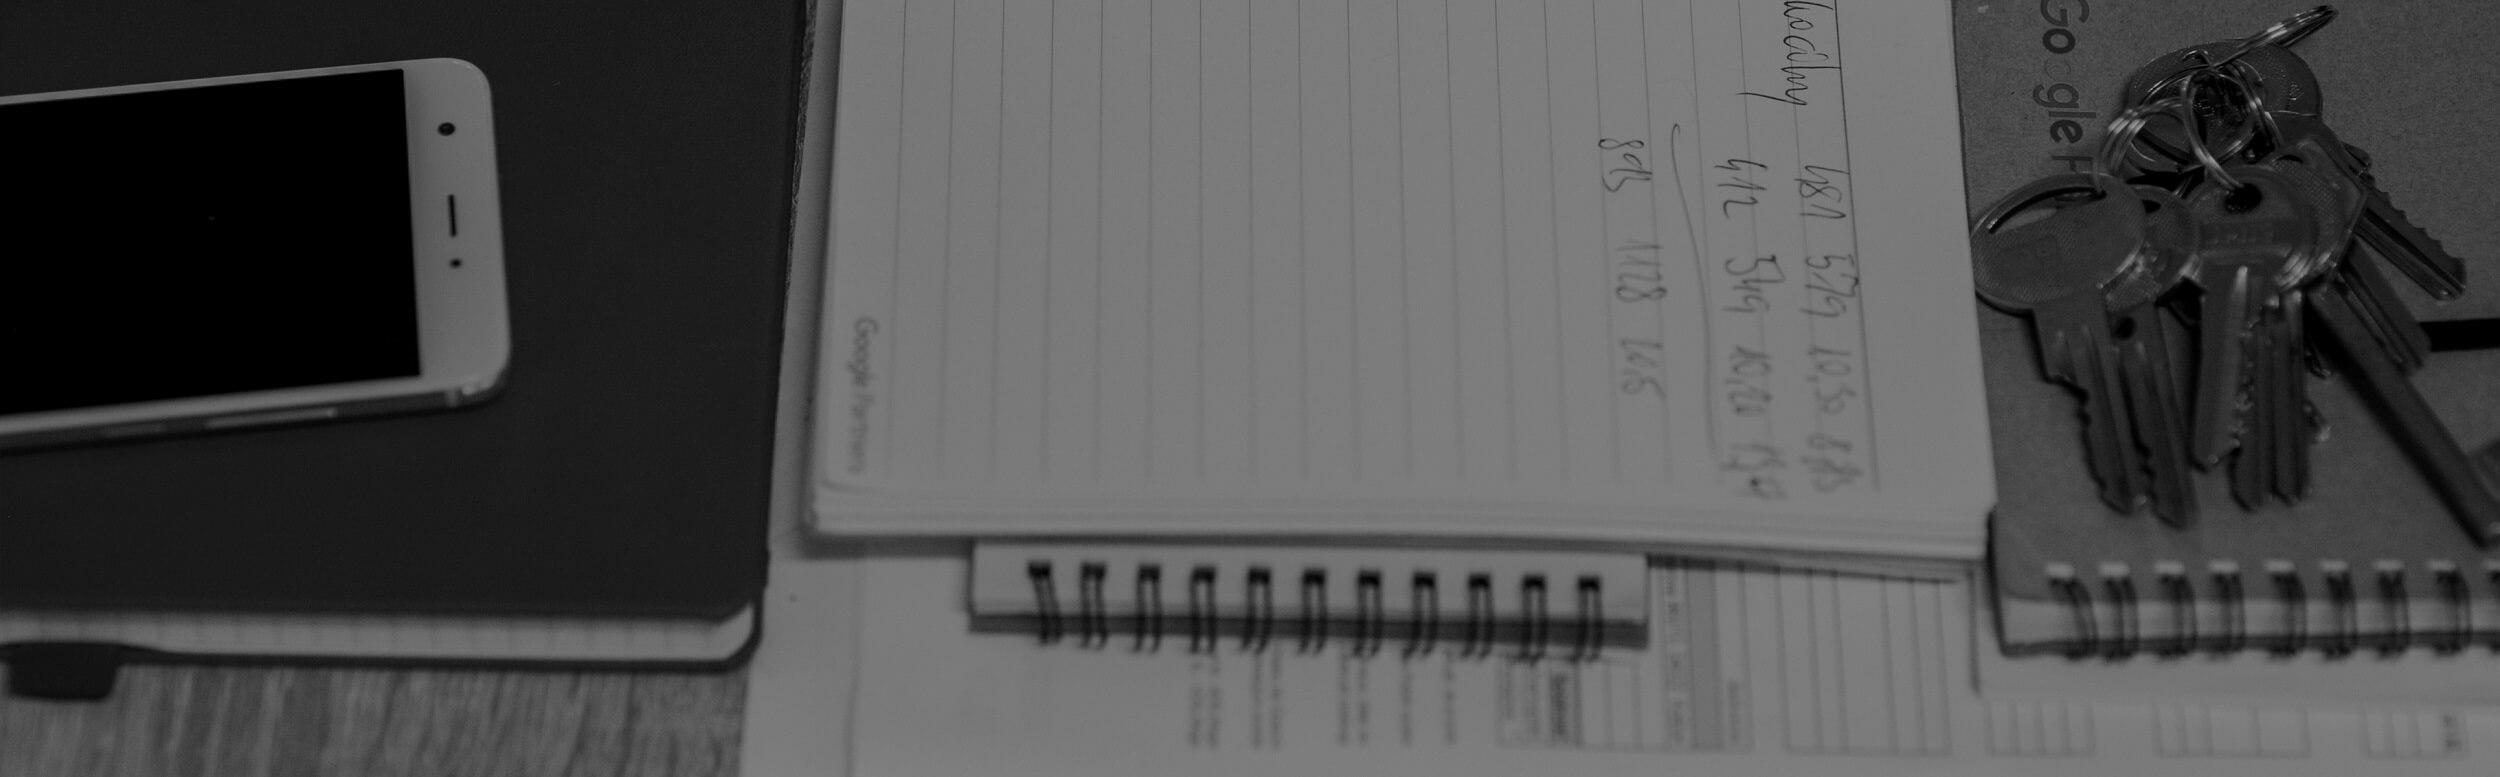 Zápisník s údajmi, mobil, kľúče na stole